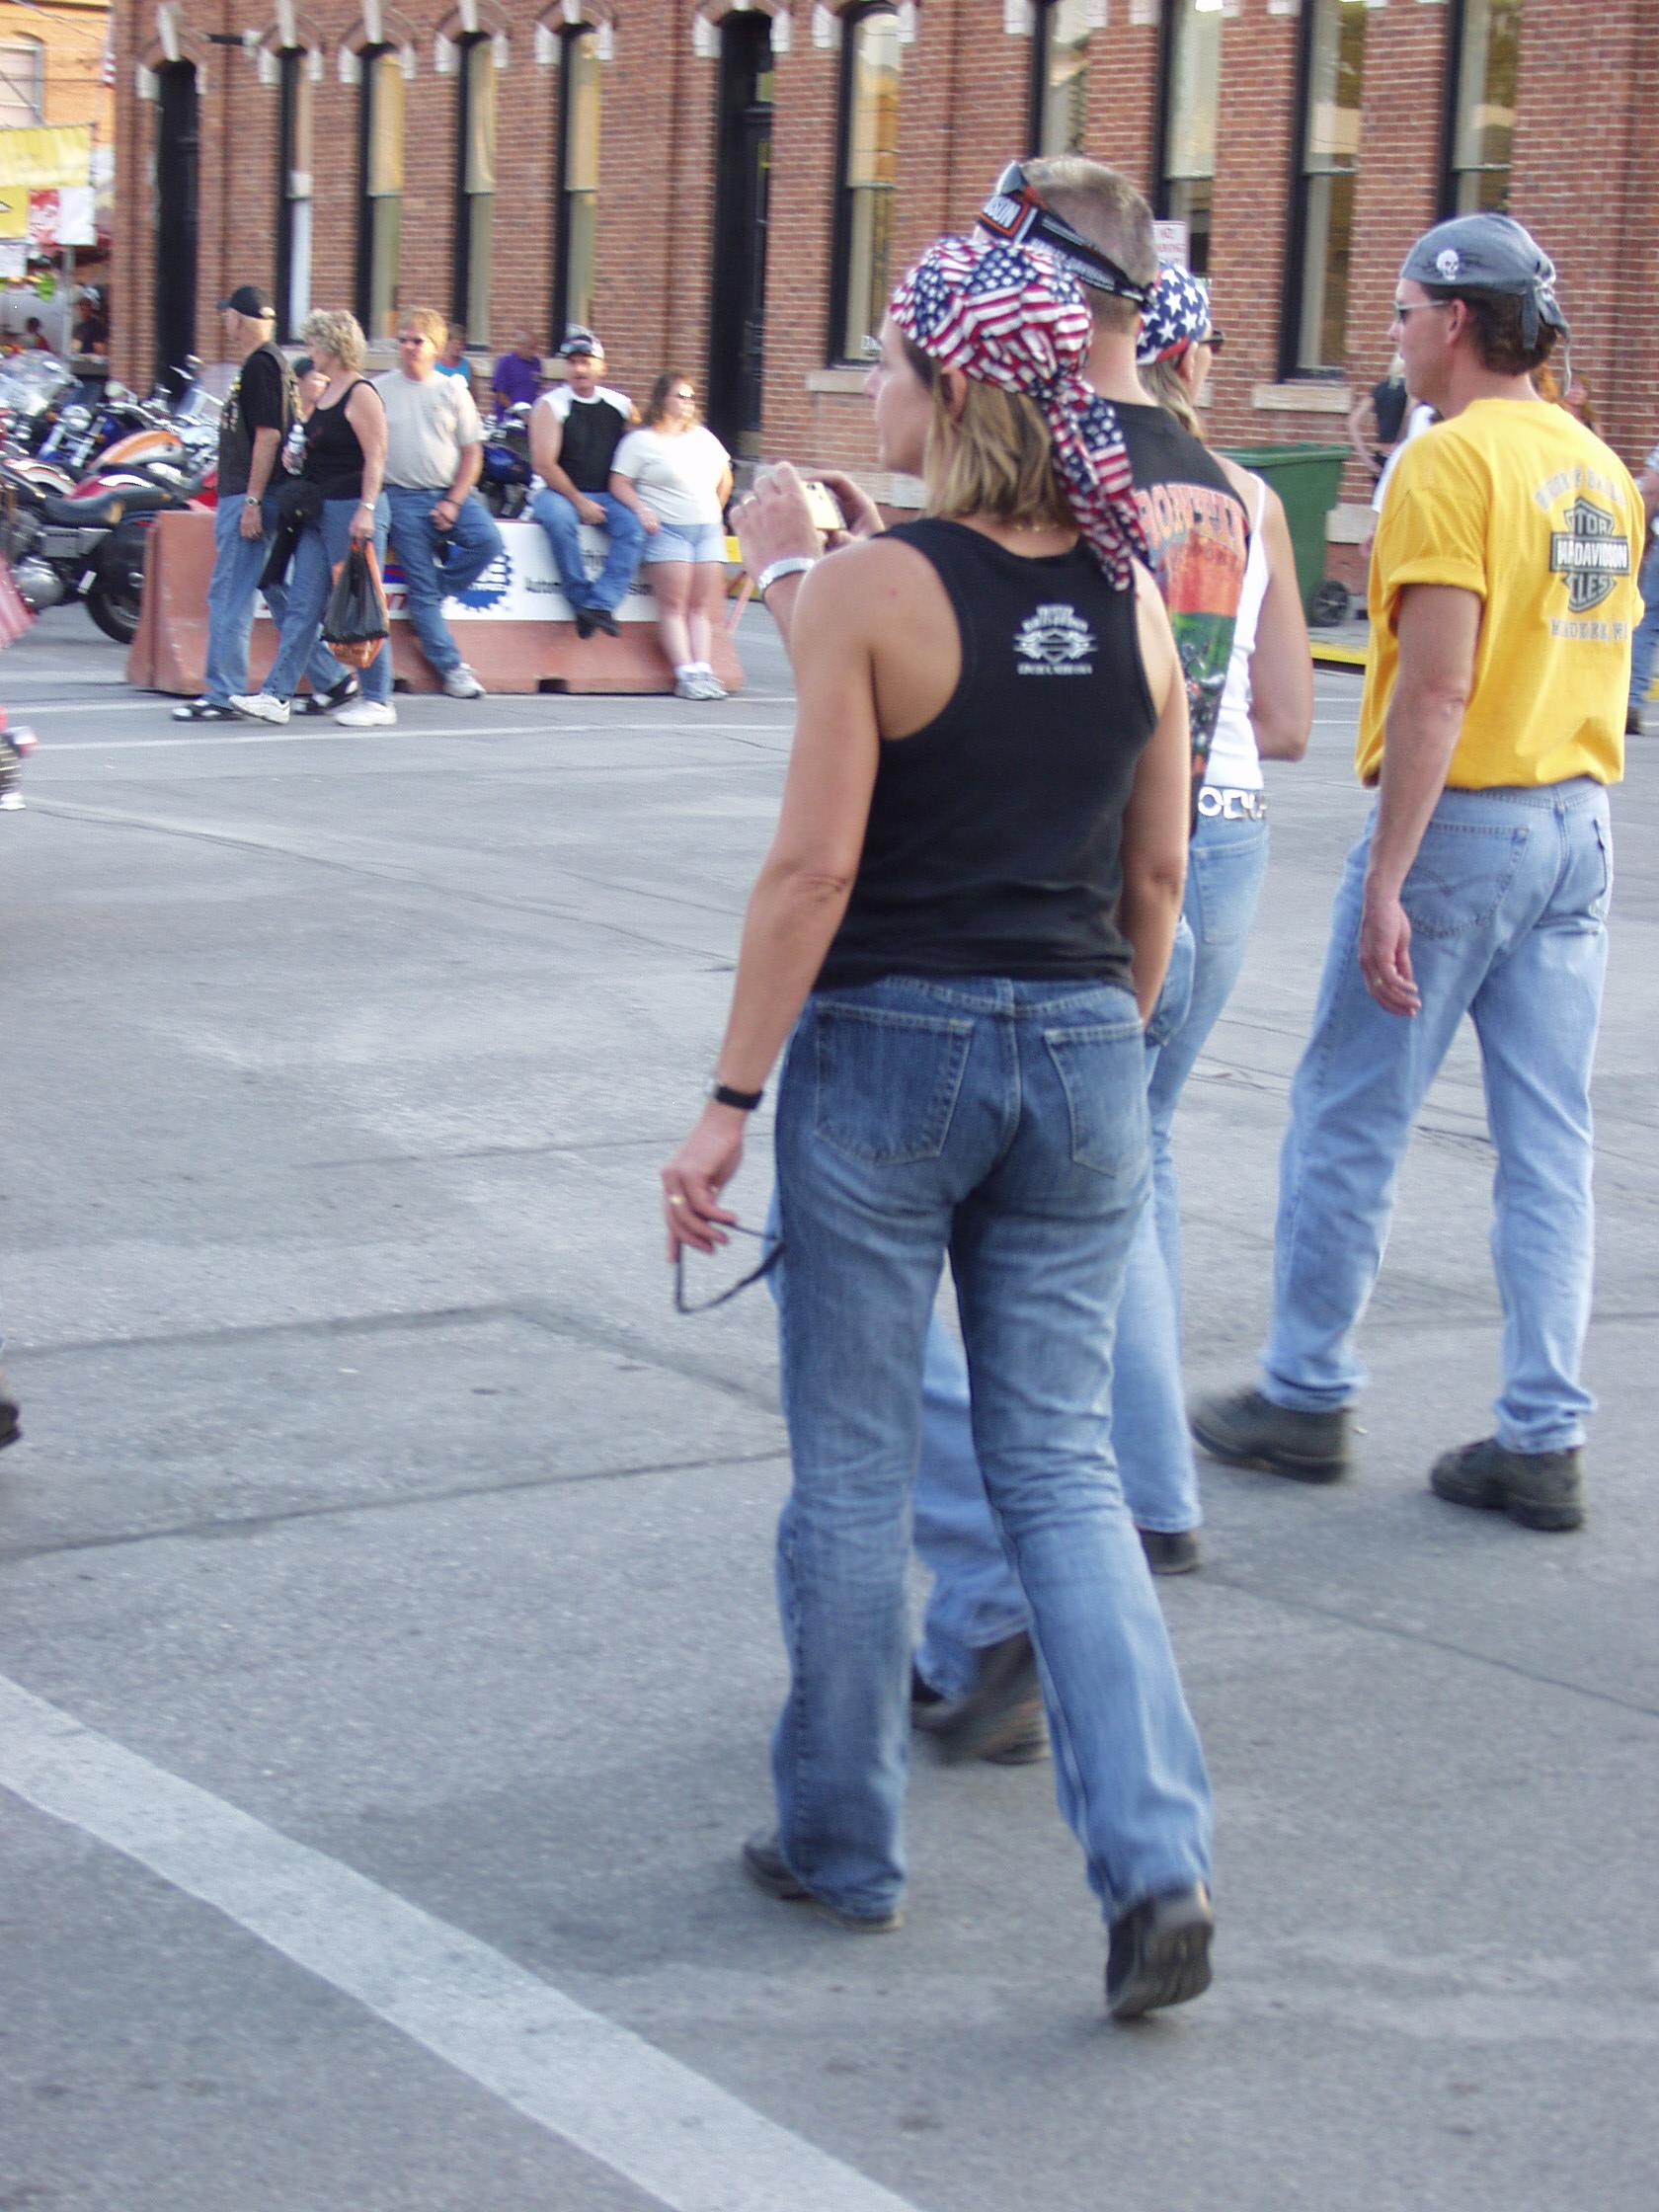 Patriot bandanna woman